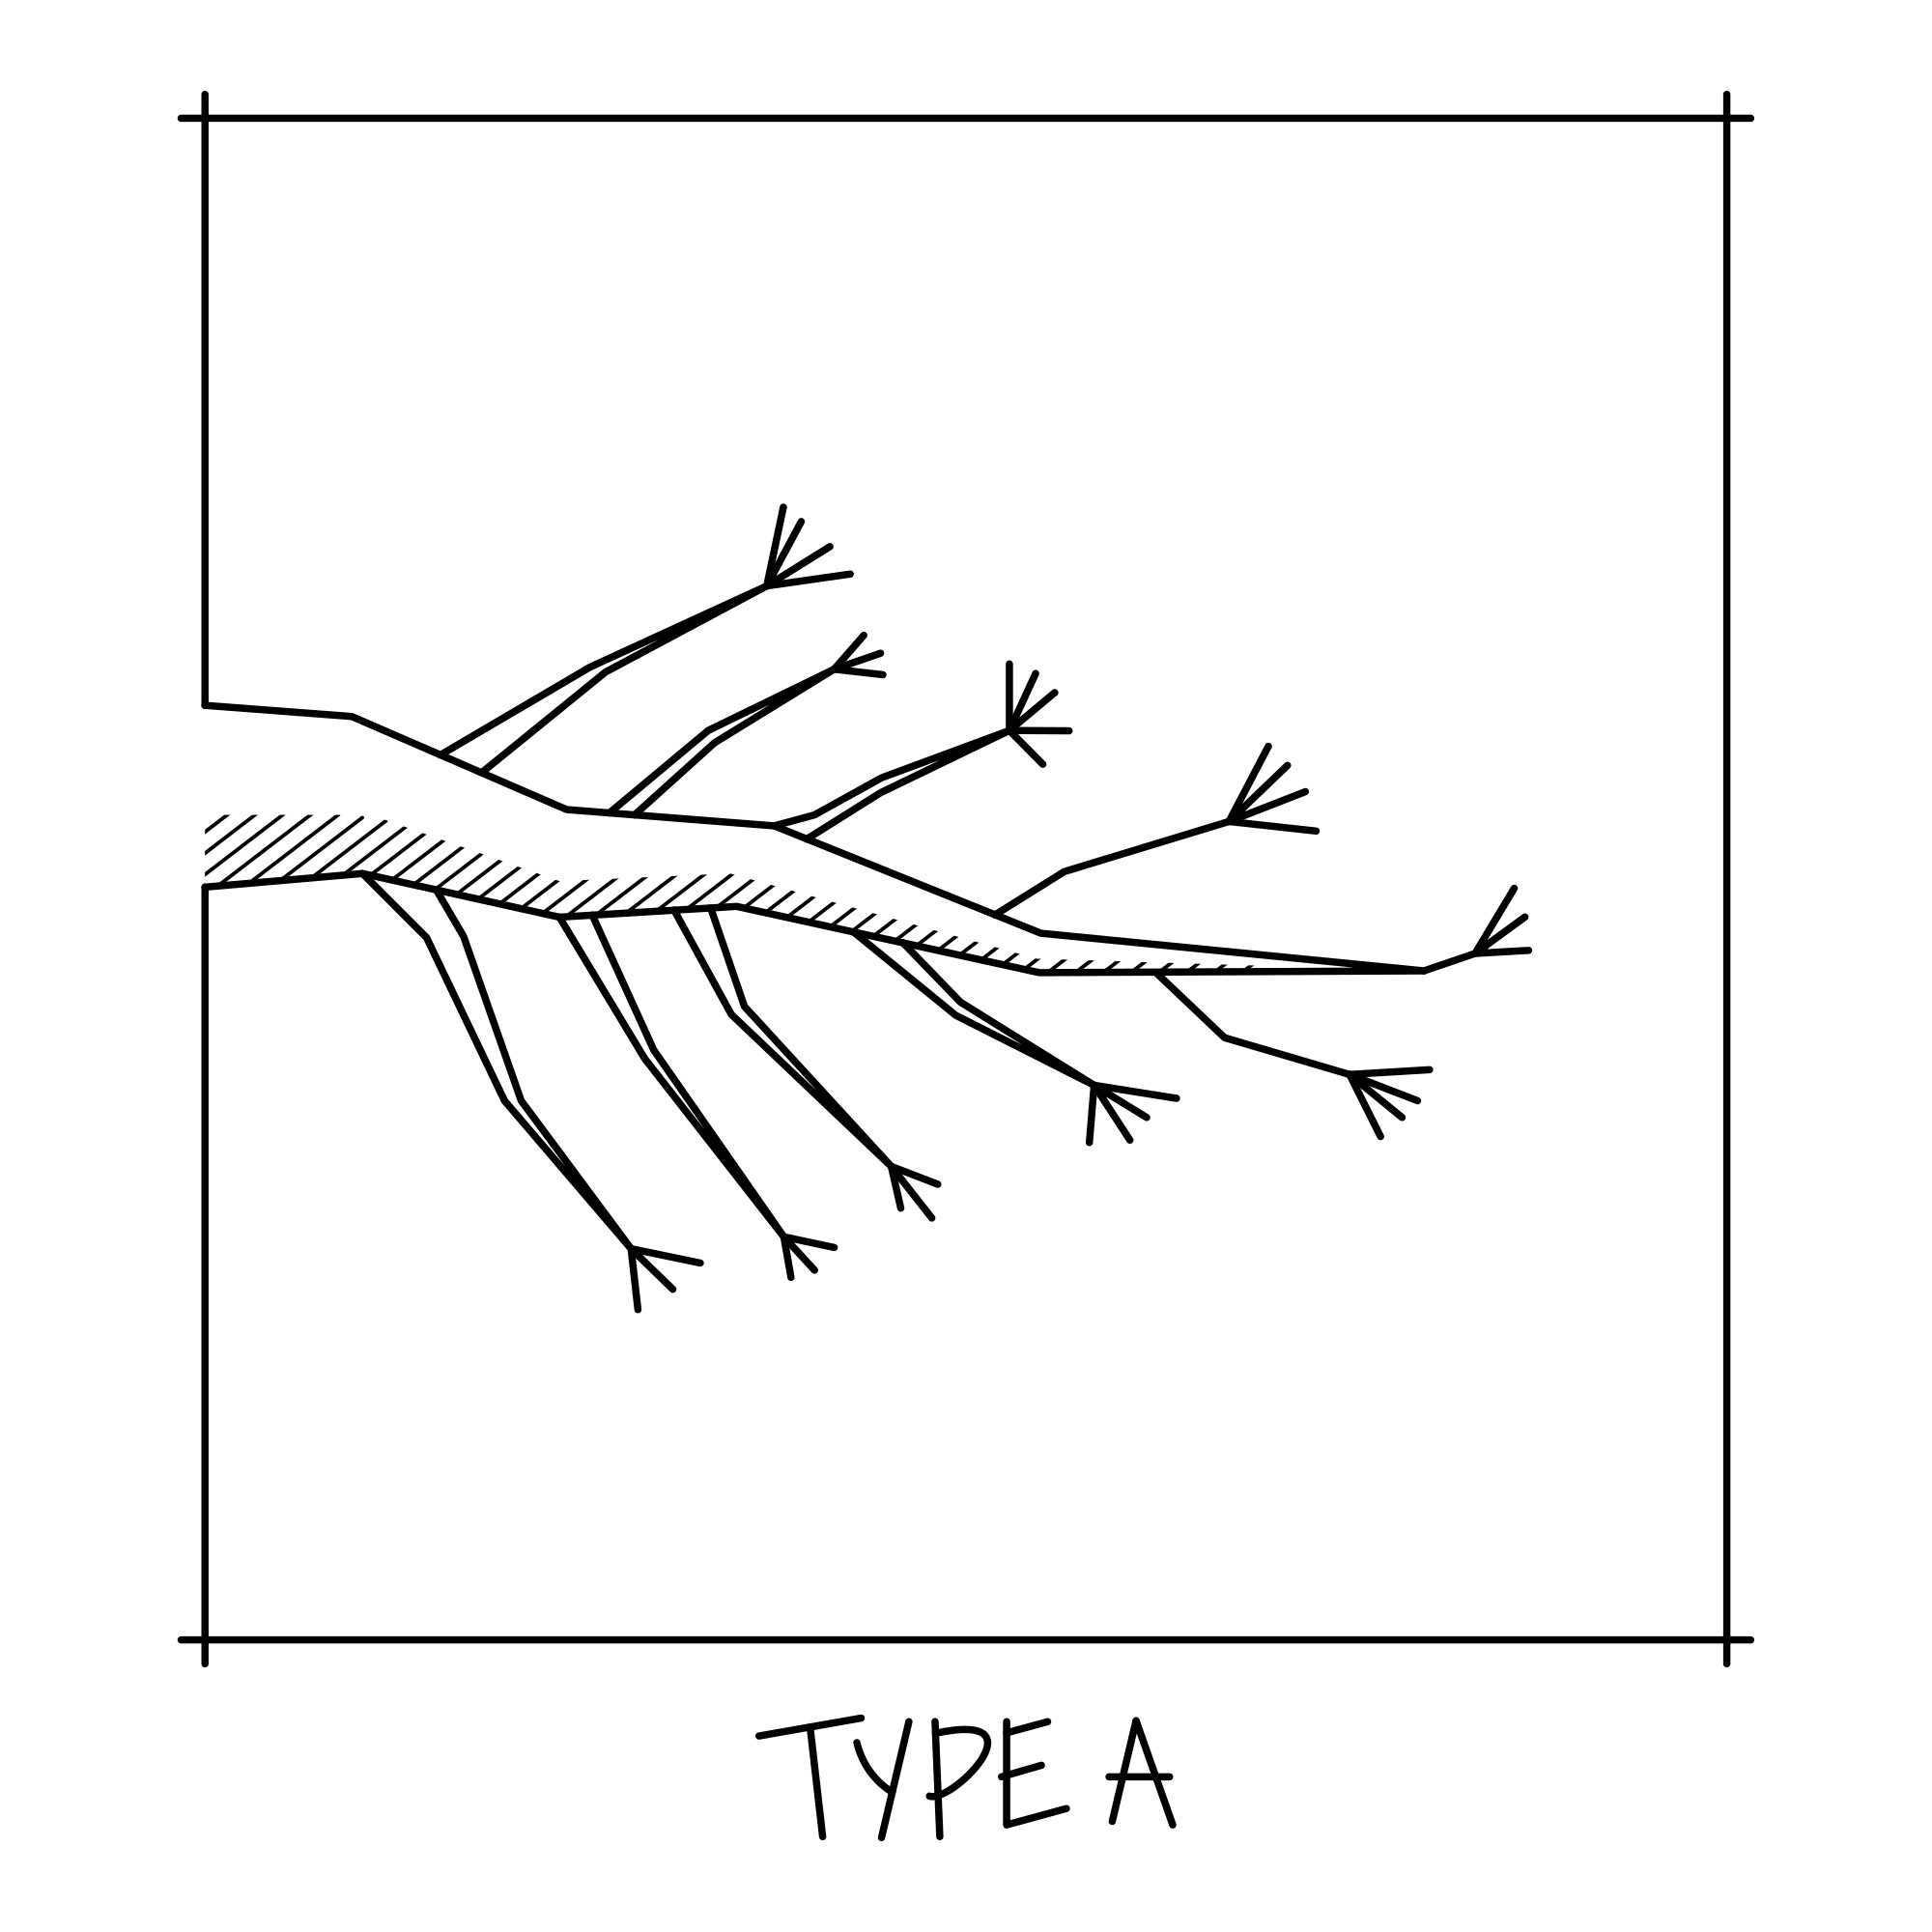 bonsai_Branch_structure